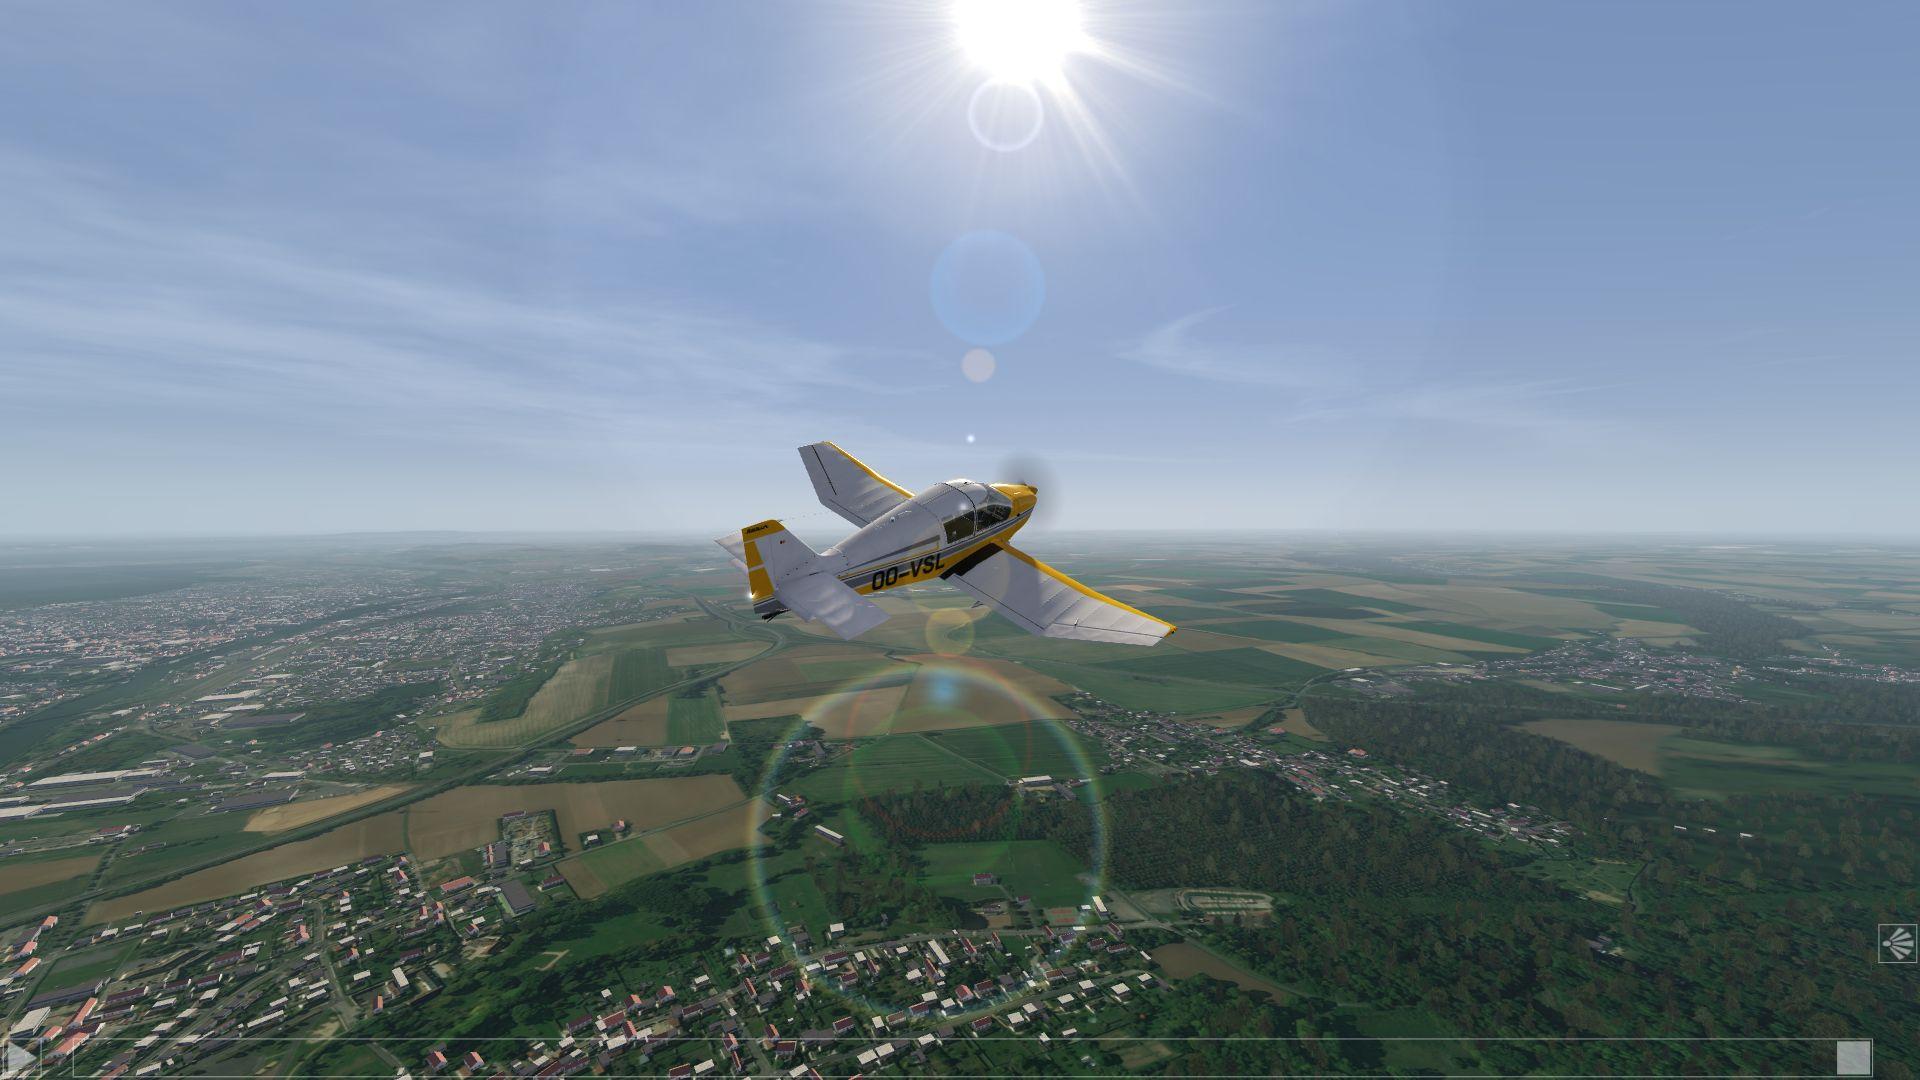 http://www.pilote-virtuel.com/img/gallery/1517065586.jpg